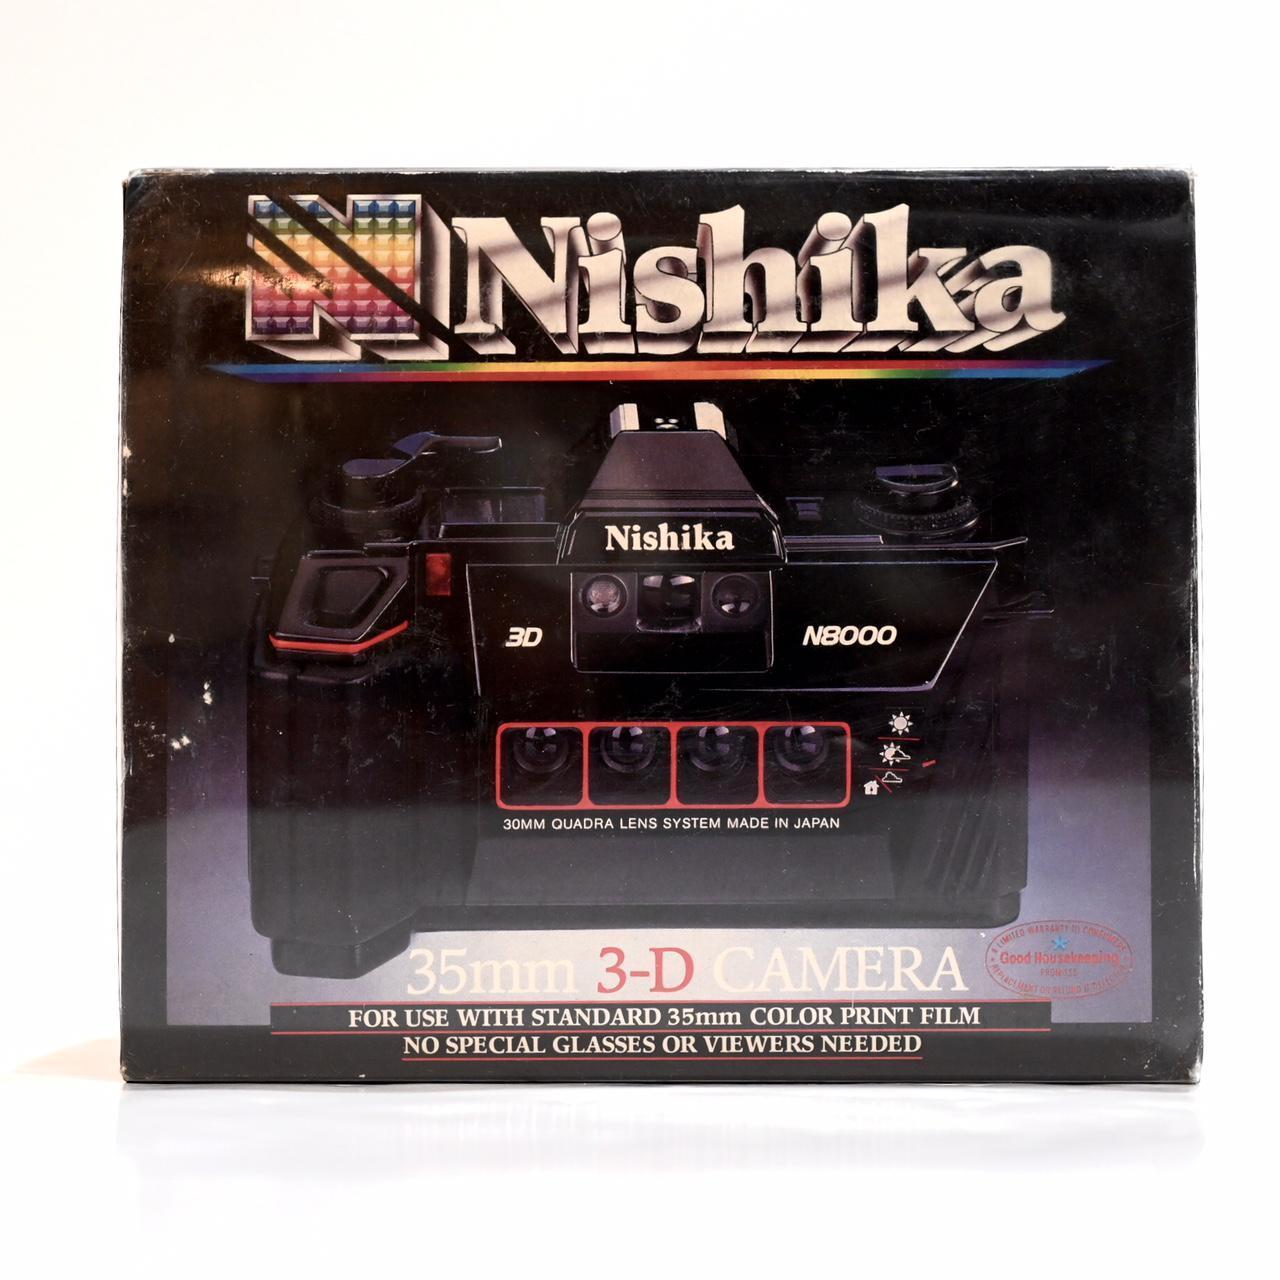 Product Image 1 - NISHIKA N8000 3-D 35MM FILM